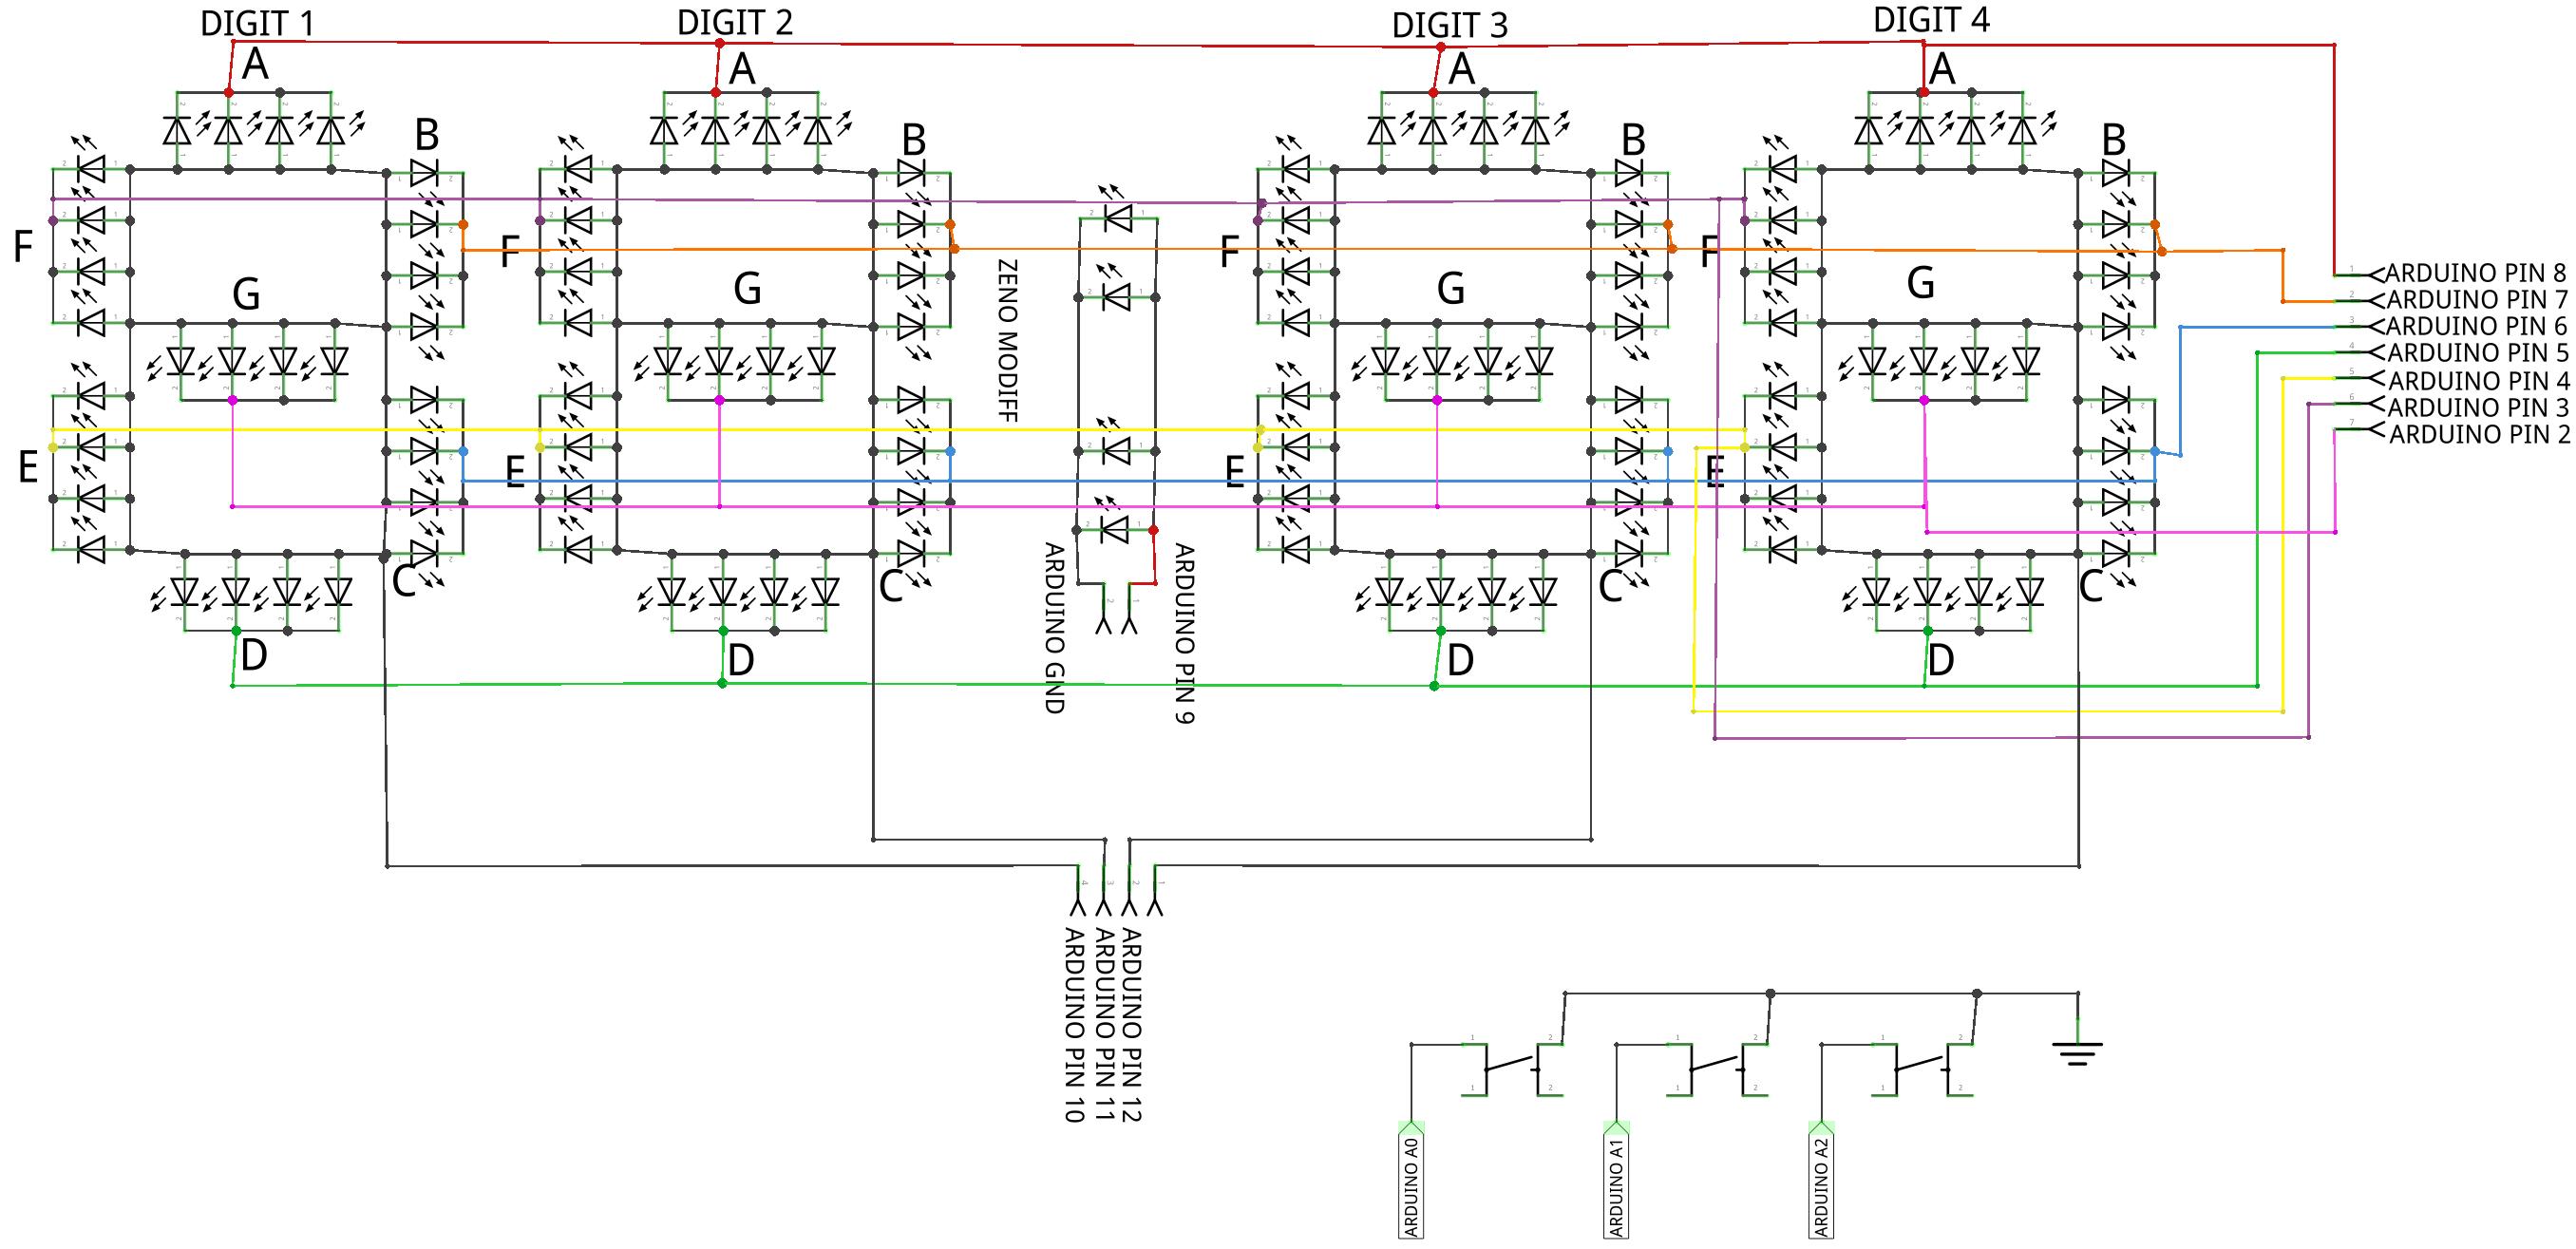 7 segment clock fritzing schem vflxt8cbo9